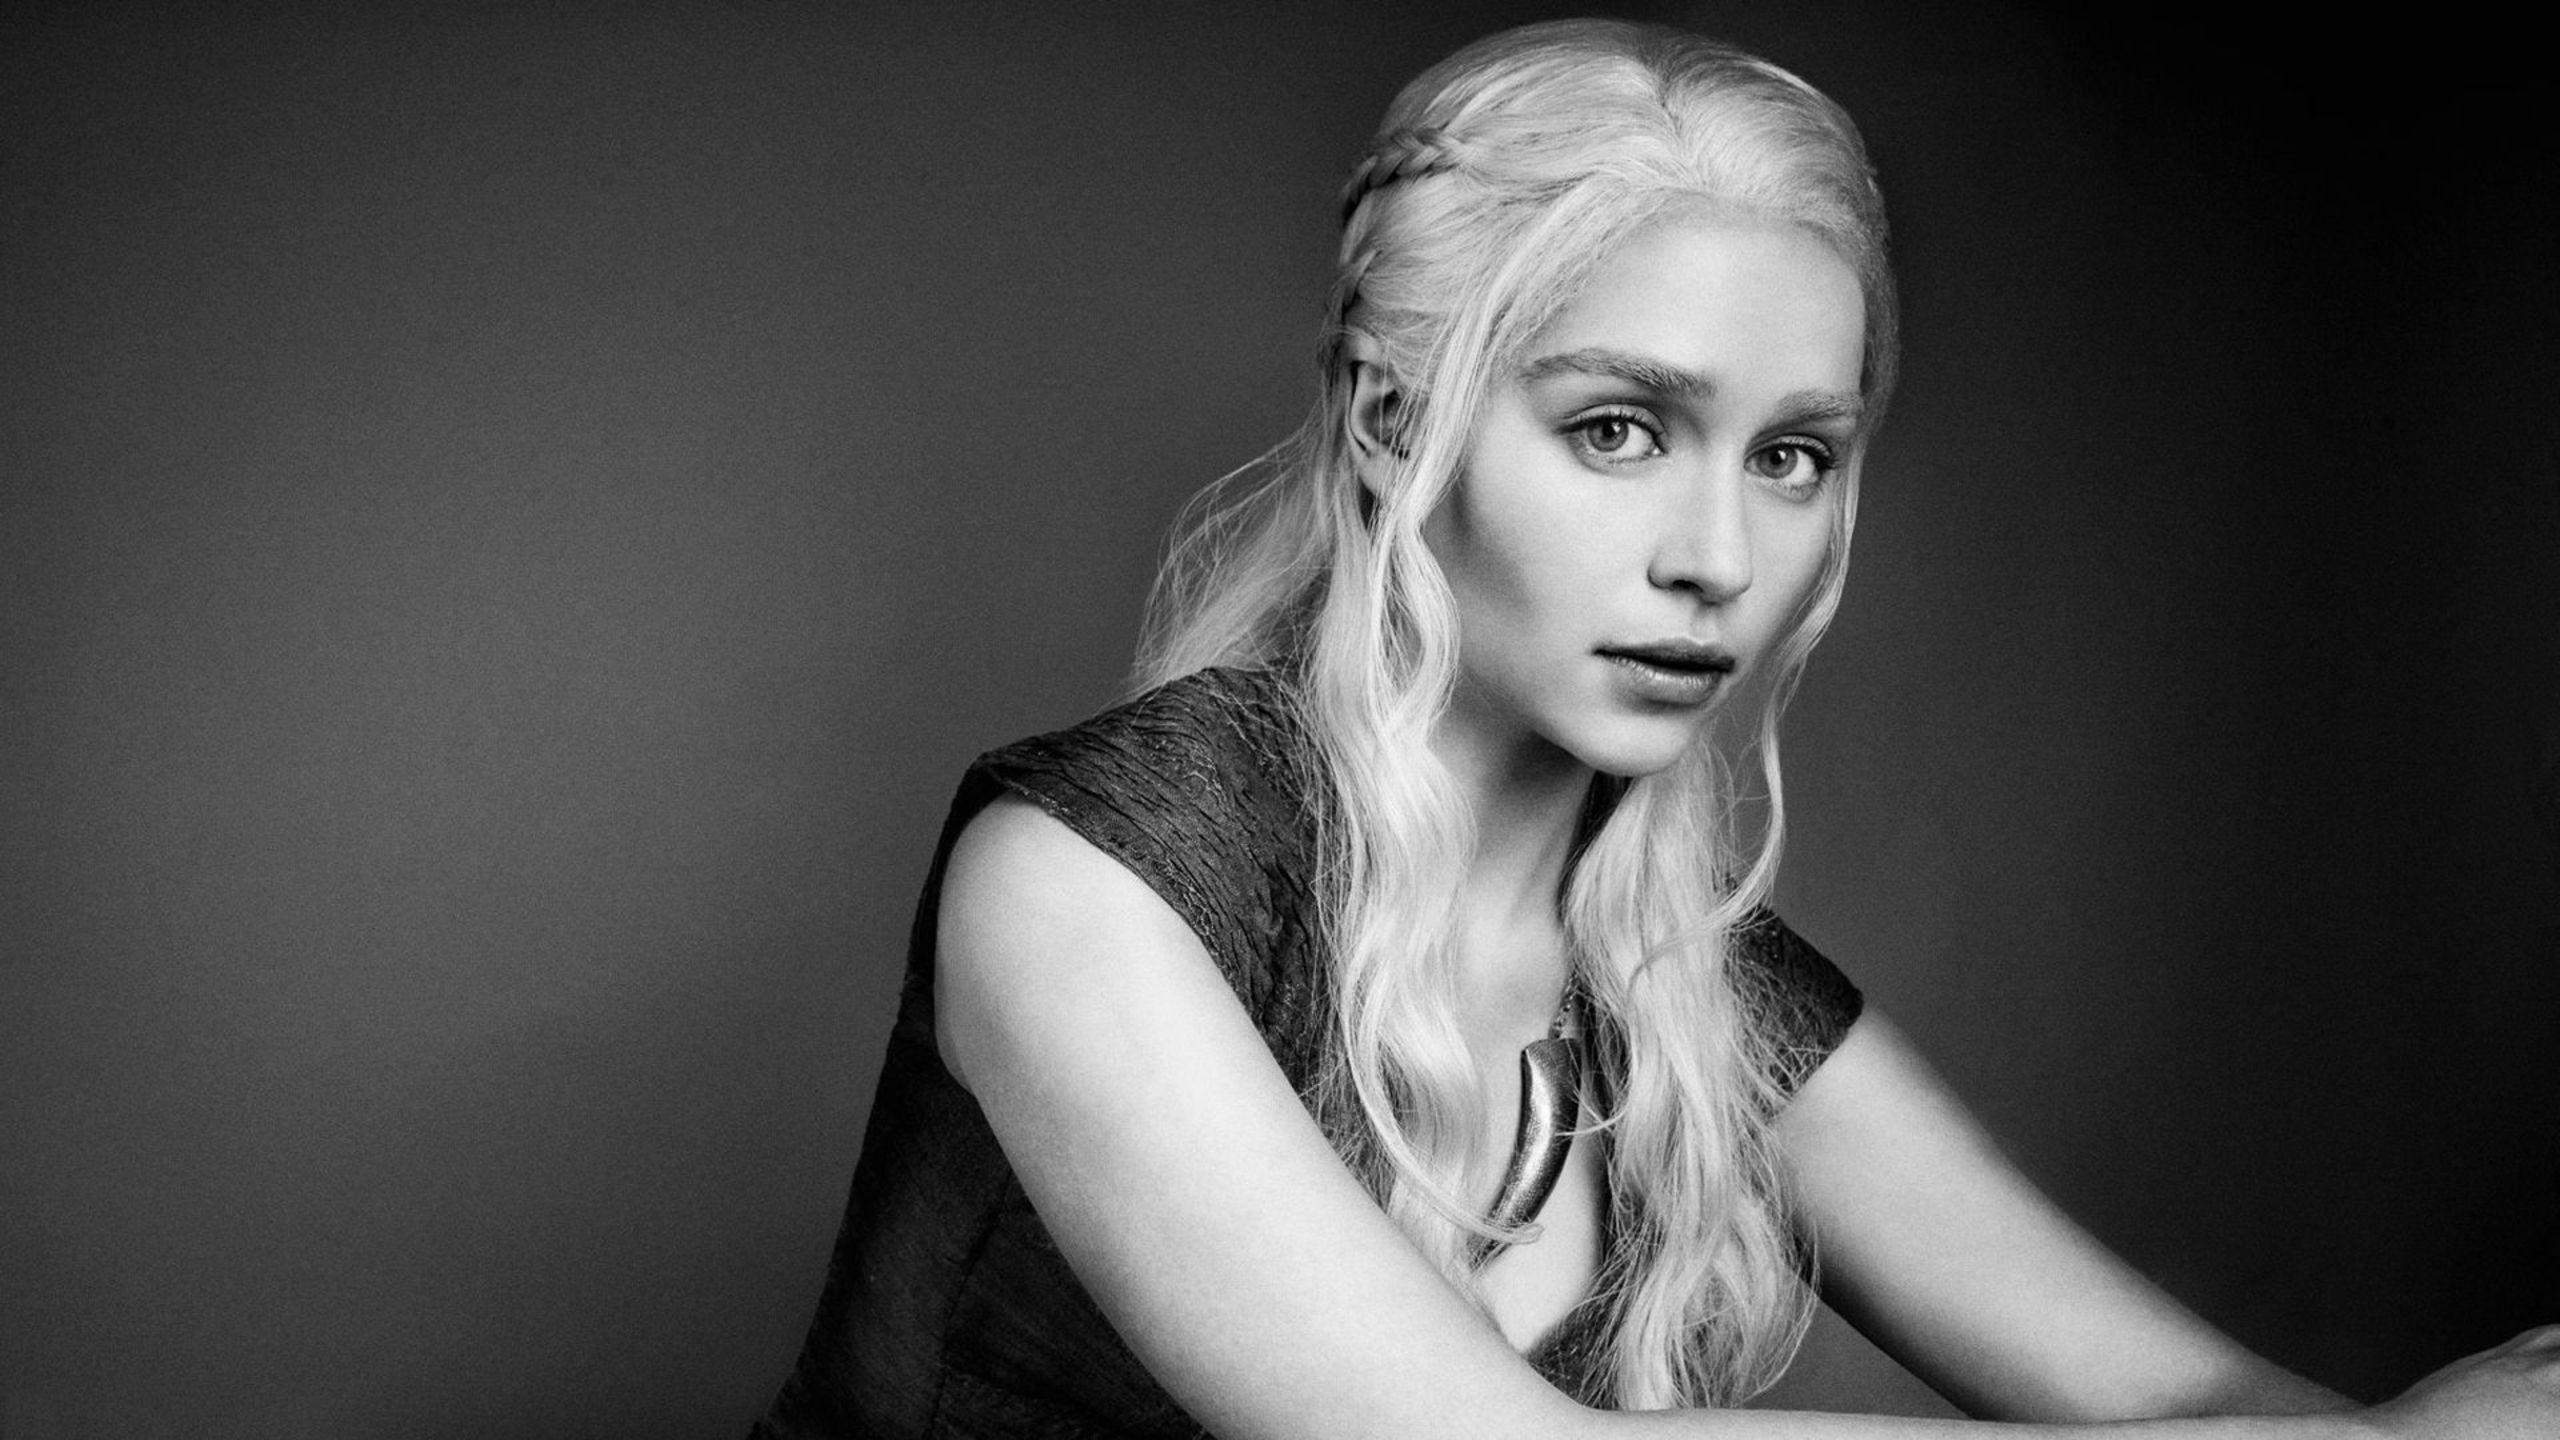 daenerys-targaryen-game-of-thrones-movie-hd-wallpaper-2560×1440-9948